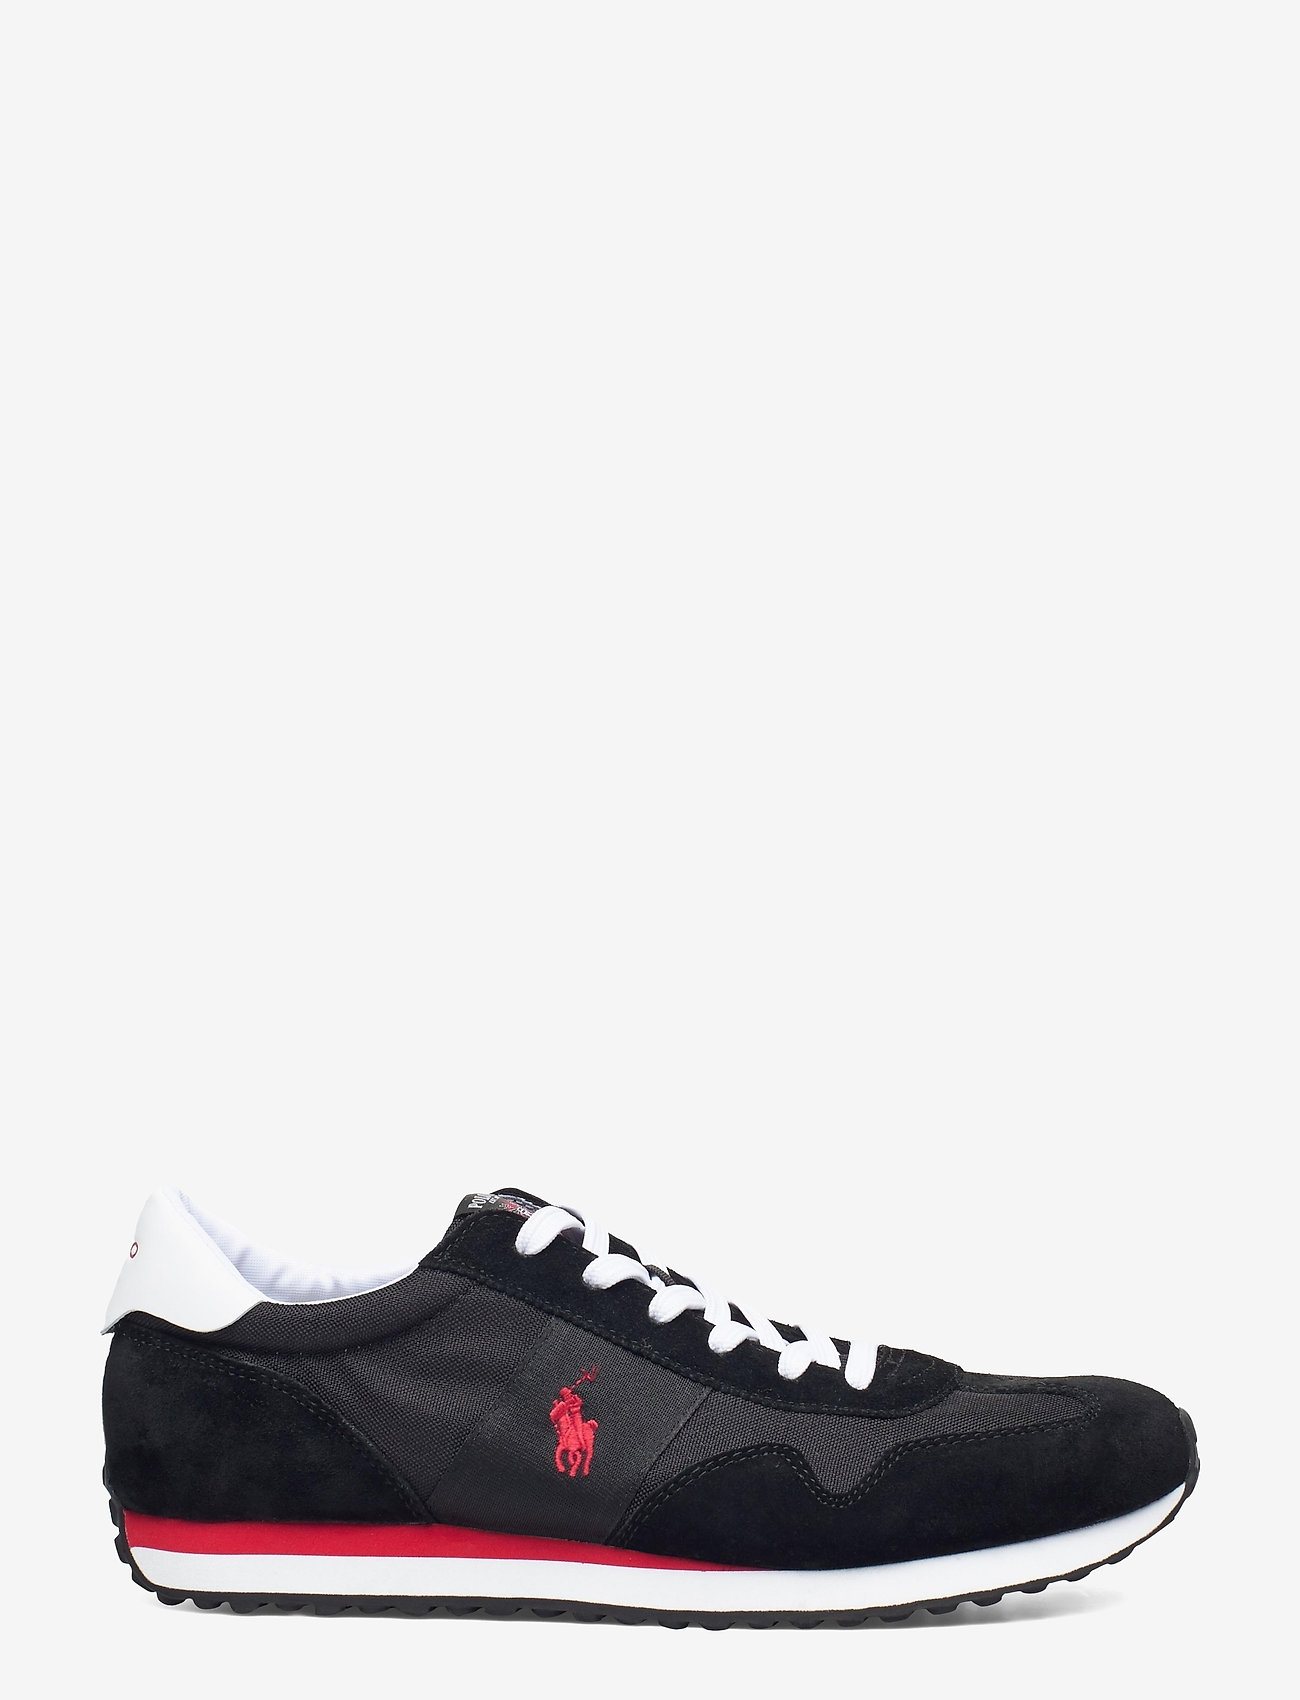 Polo Ralph Lauren - Train 85 Sneaker - low tops - black/rl2000 red - 1